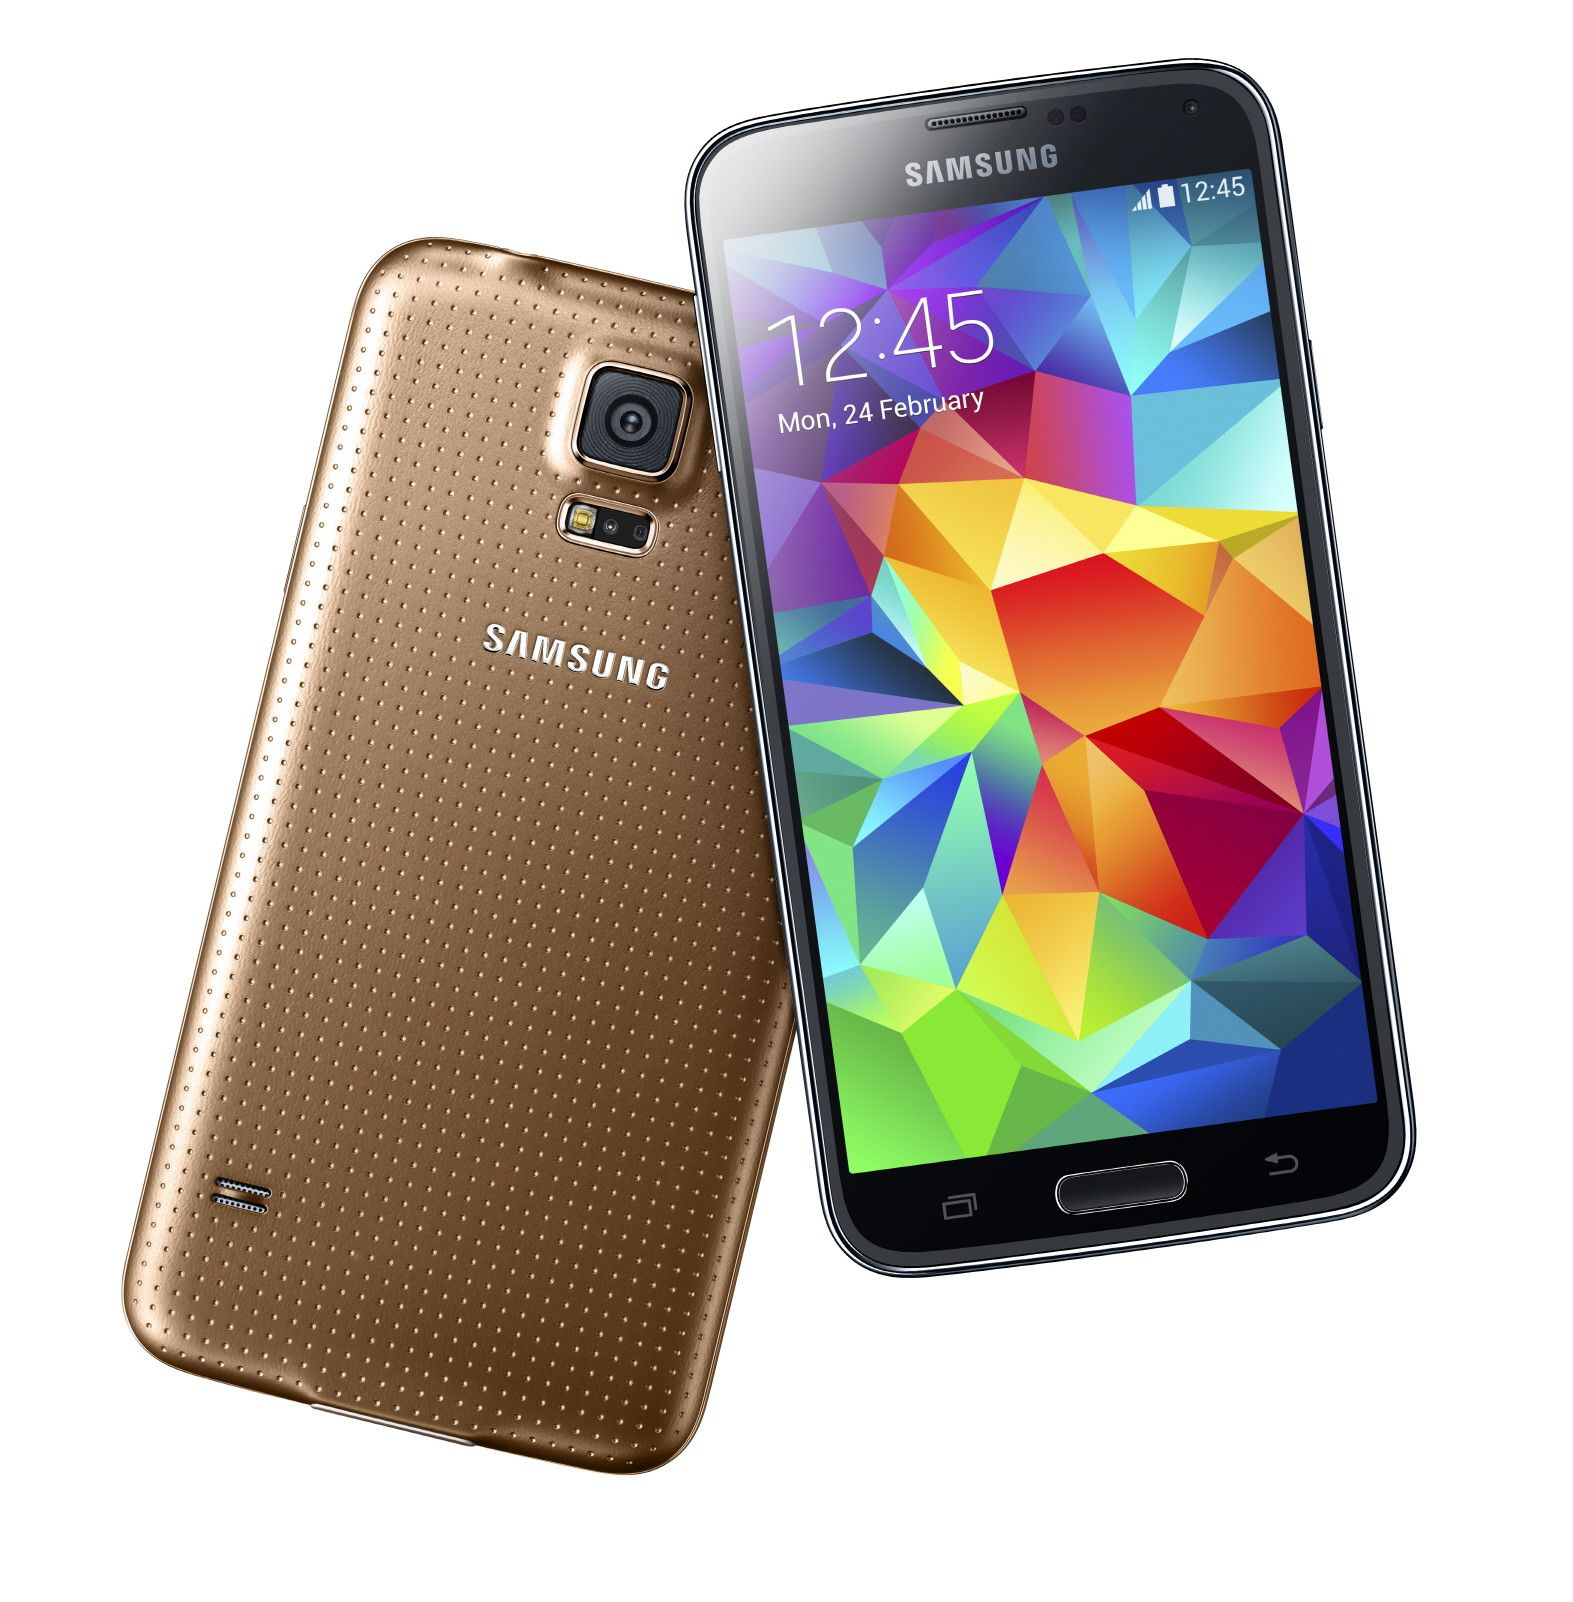 Rentree Branchee Smartphone Alpha Gold Samsung 599 99 Euros Avec Images Samsung Galaxy S5 Samsung Galaxie